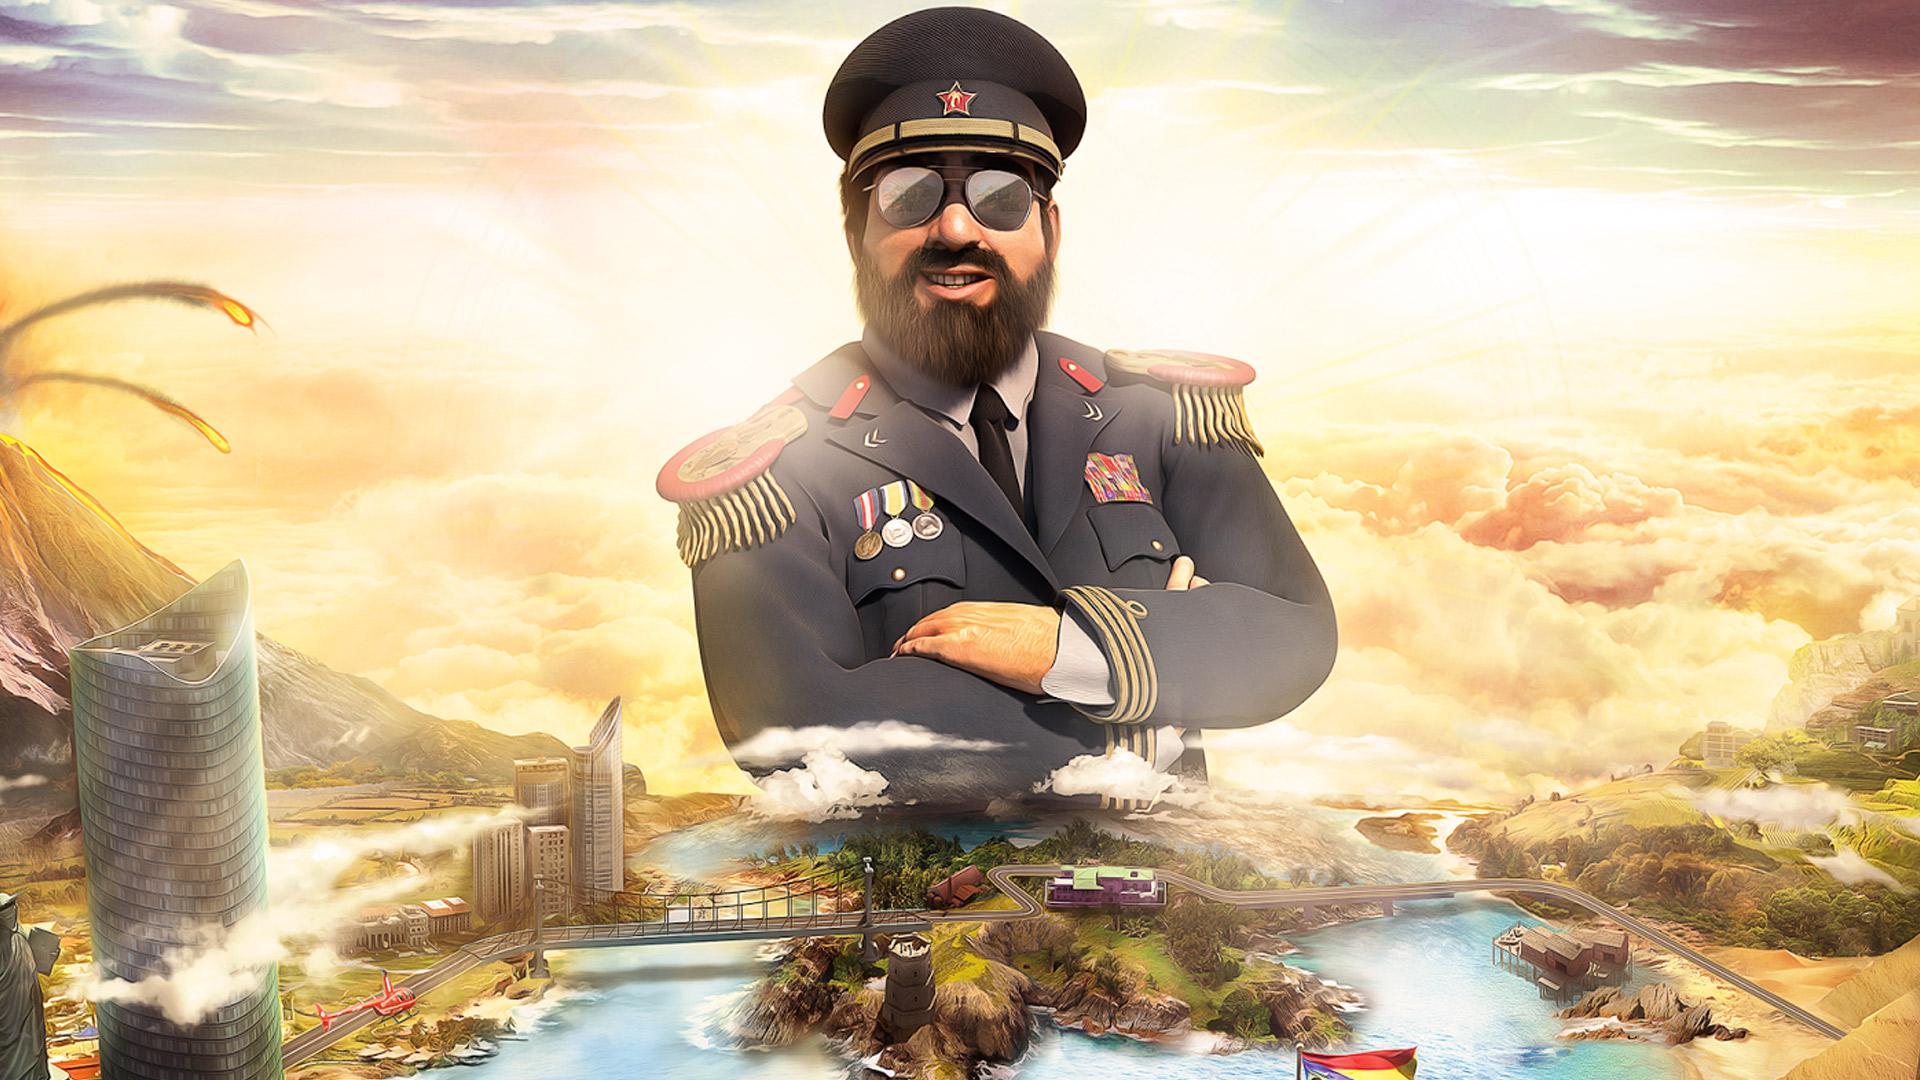 Tropico 6 Wallpaper HD